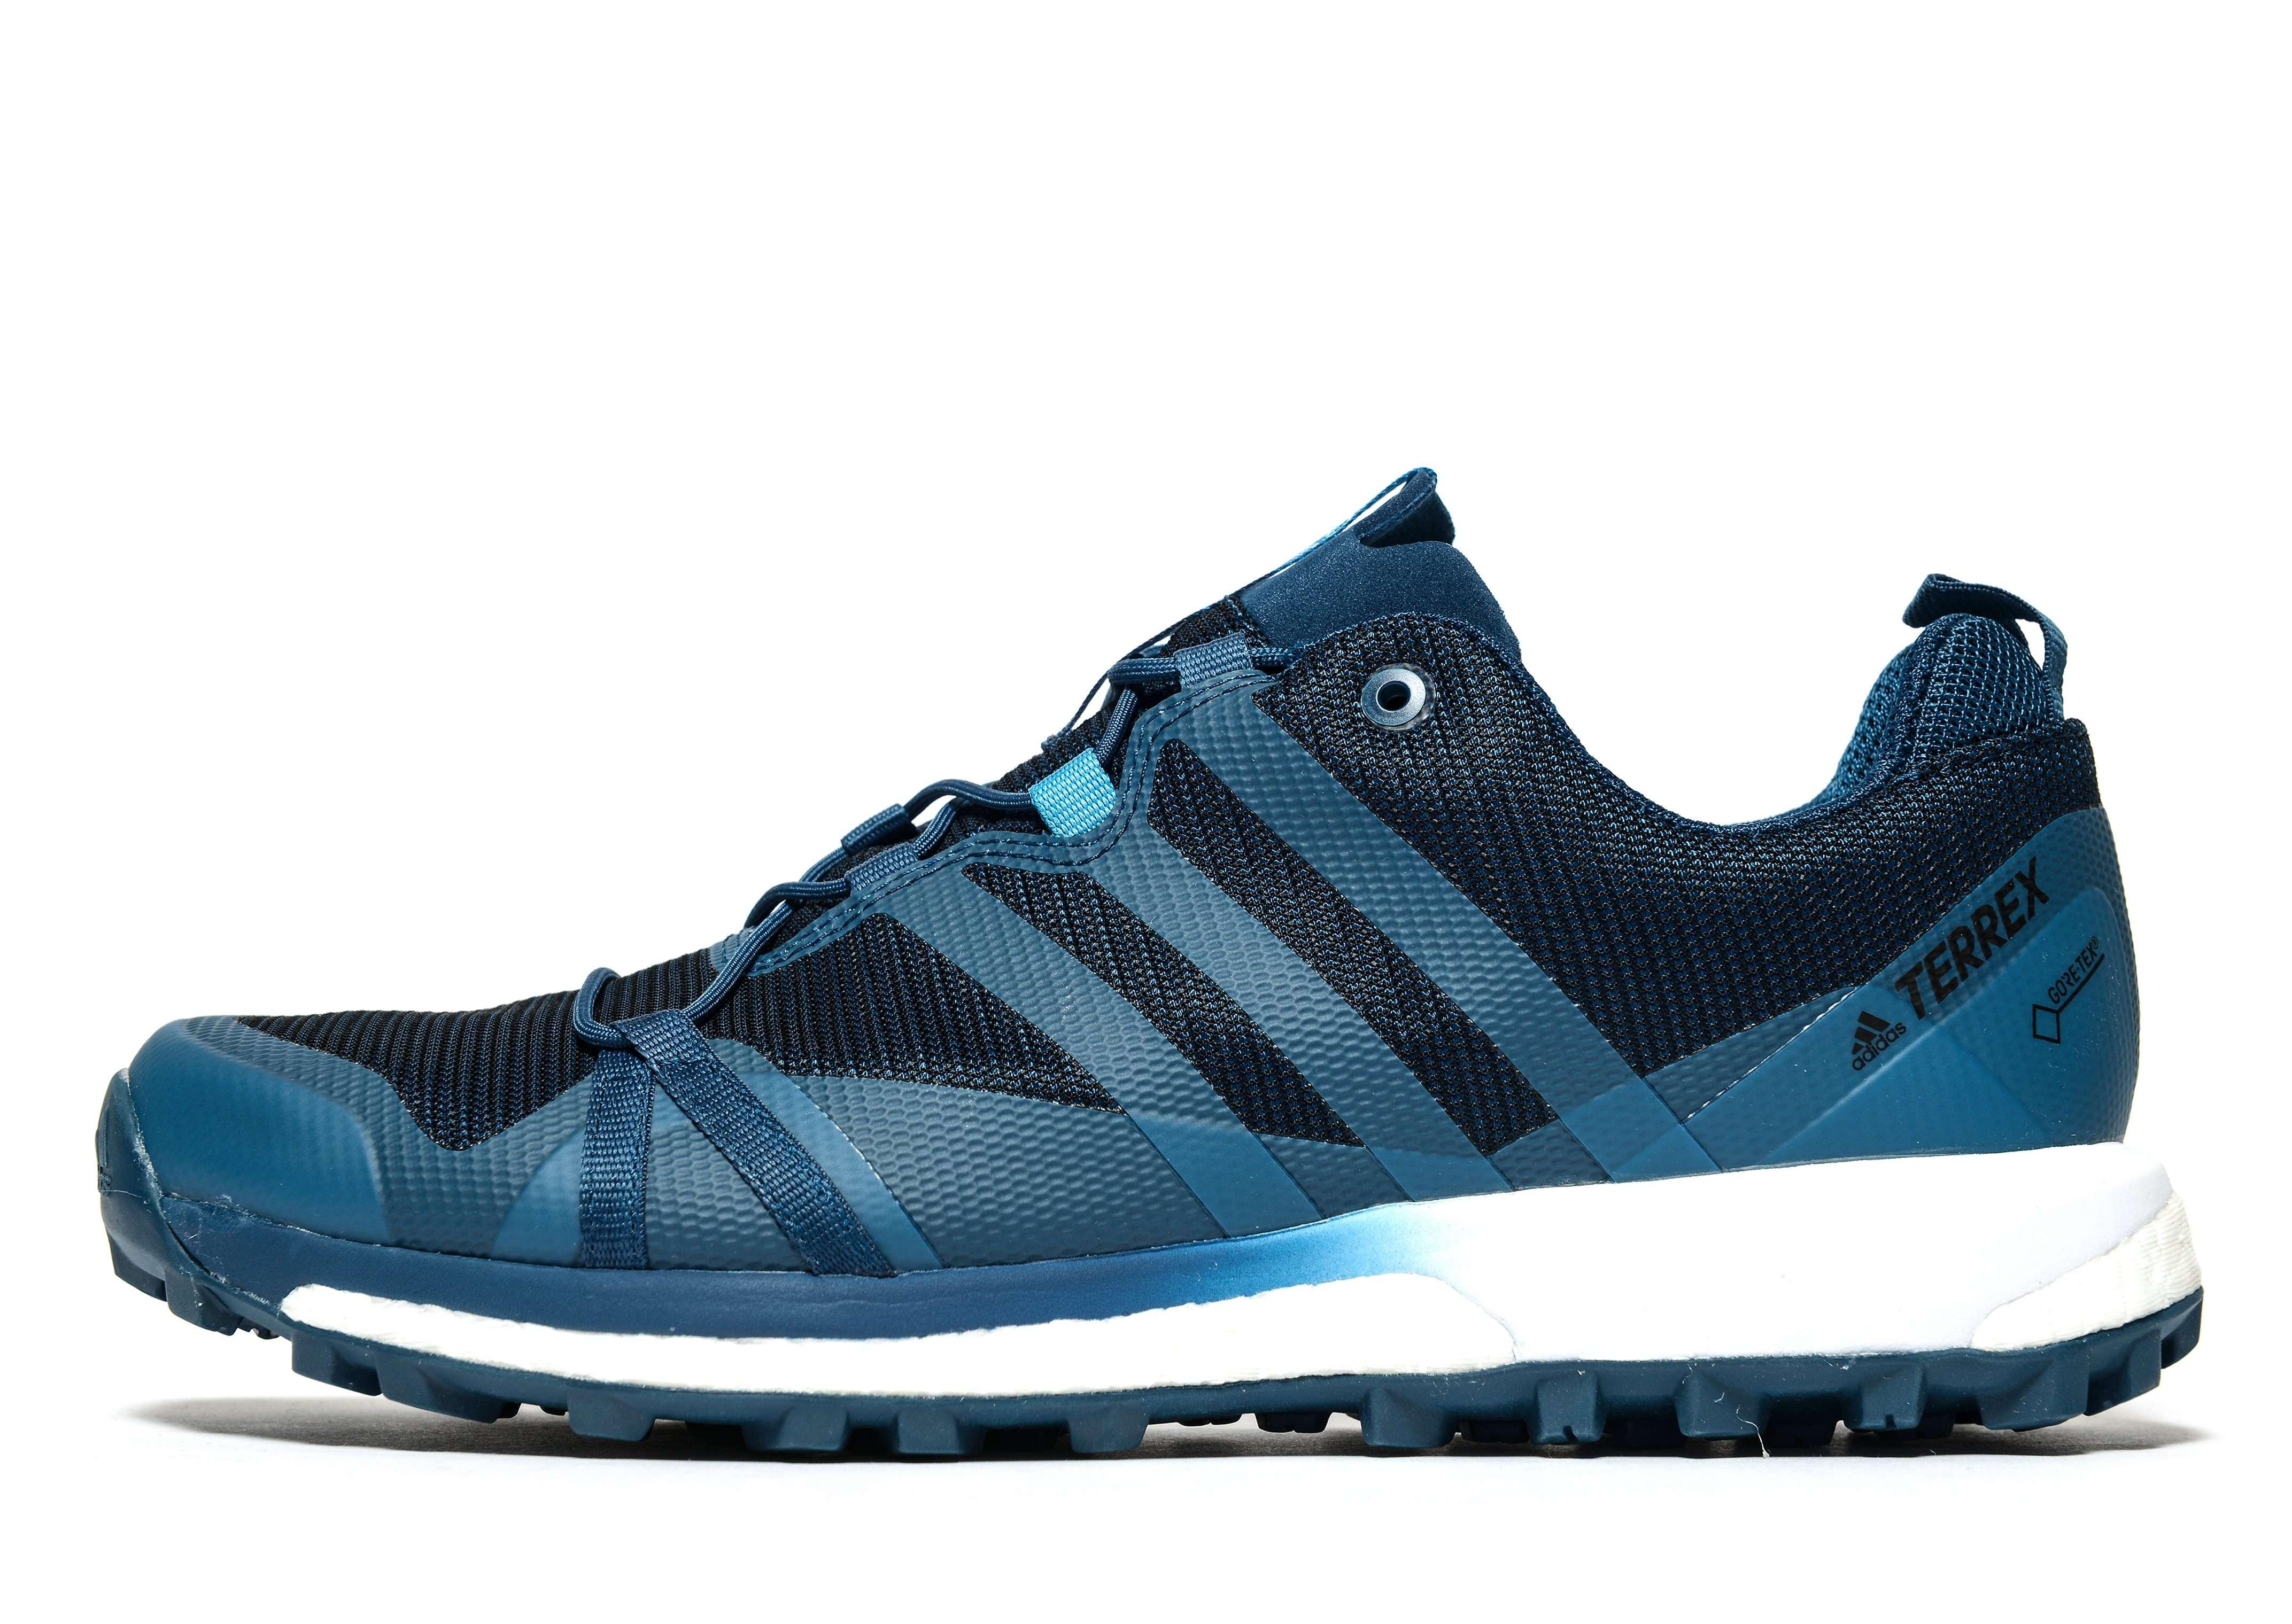 175d82743d9 adidas Terrex Agravic GTX Trail Running Shoes